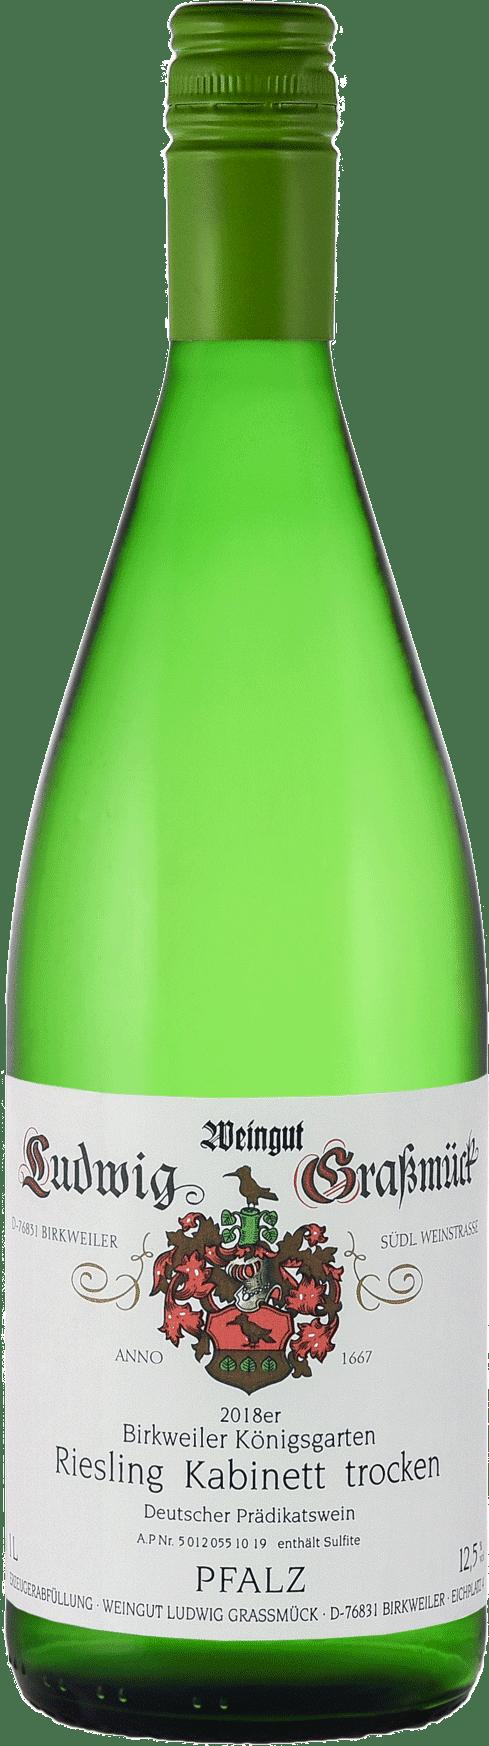 Weingut Ludwig Graßmück, Simon Graßmück, Riesling Kabinett, trocken